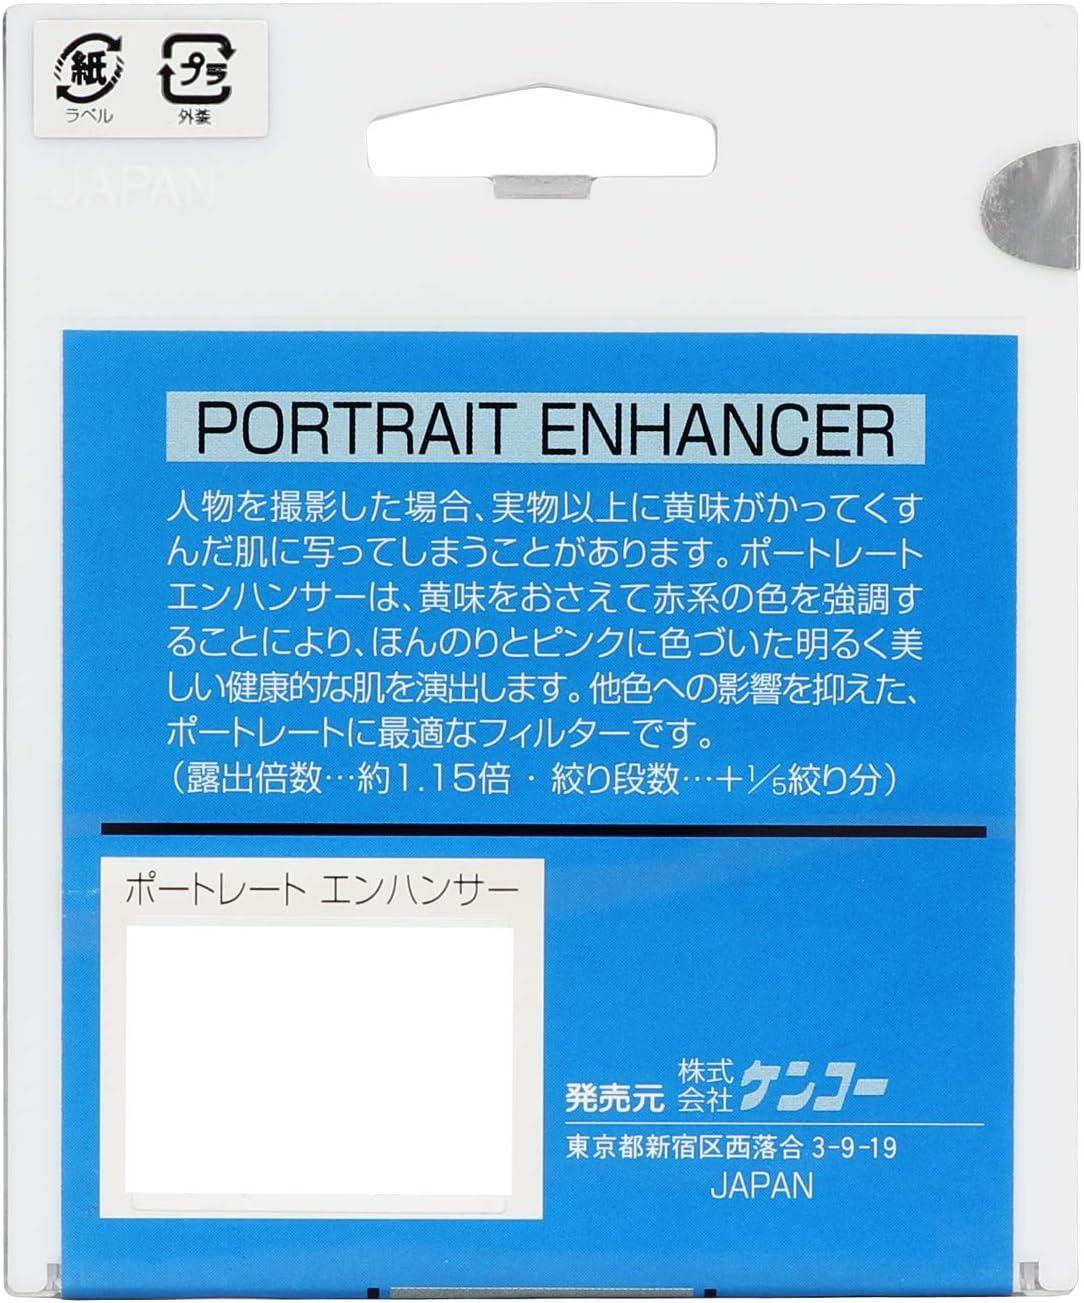 Kenko 52mm Portrait Enhancer Camera Lens Filters